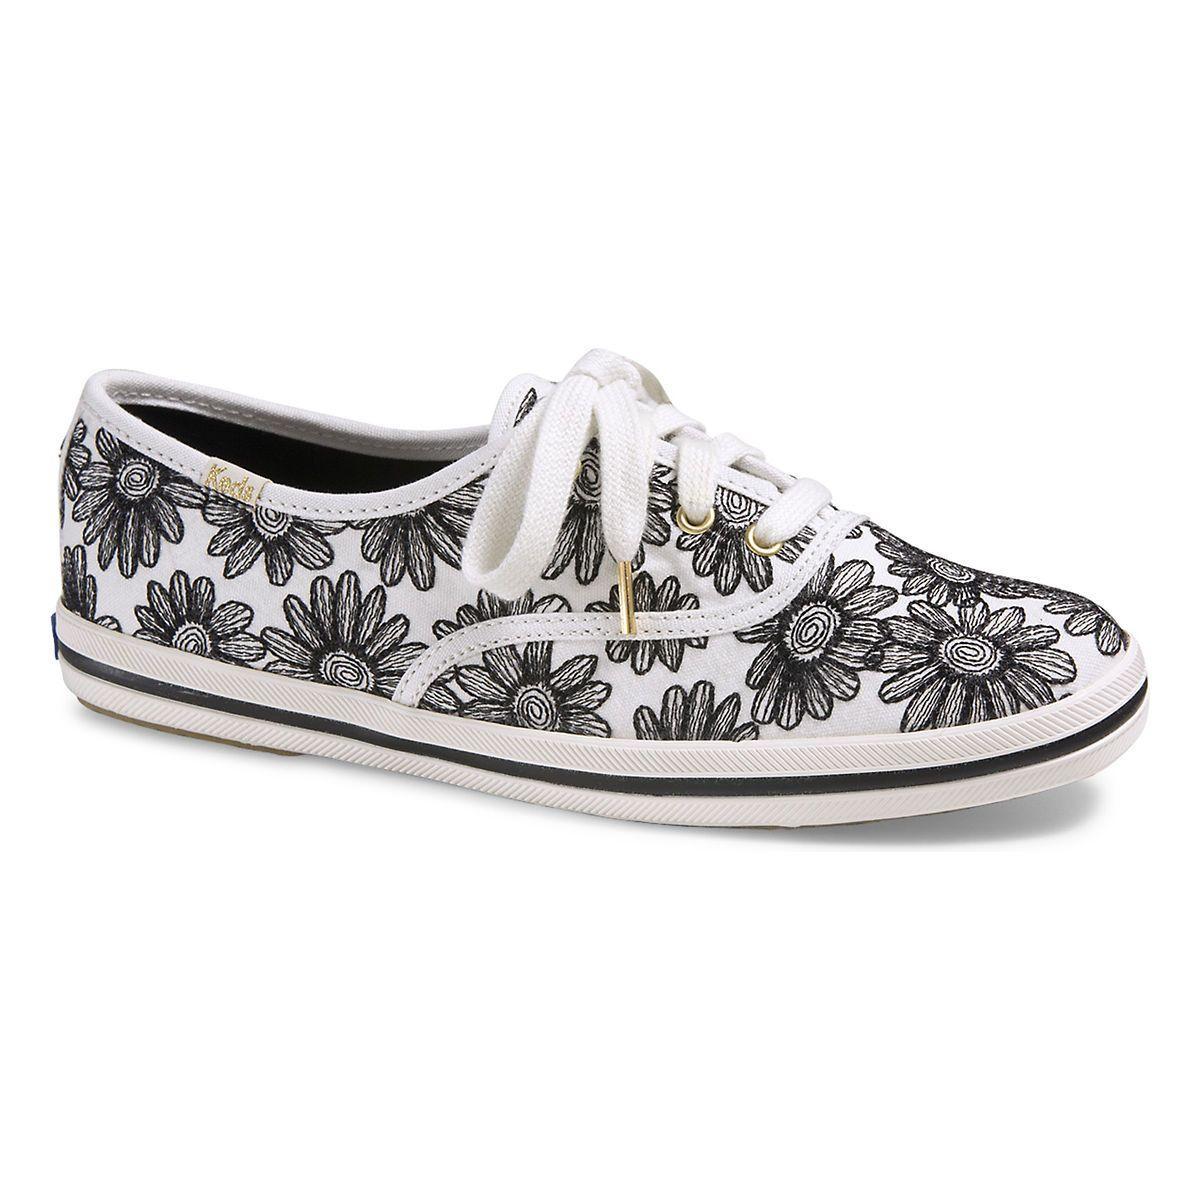 832360a0e6d4a0 Keds Philippines  Keds price list - Keds Sneaker Shoes